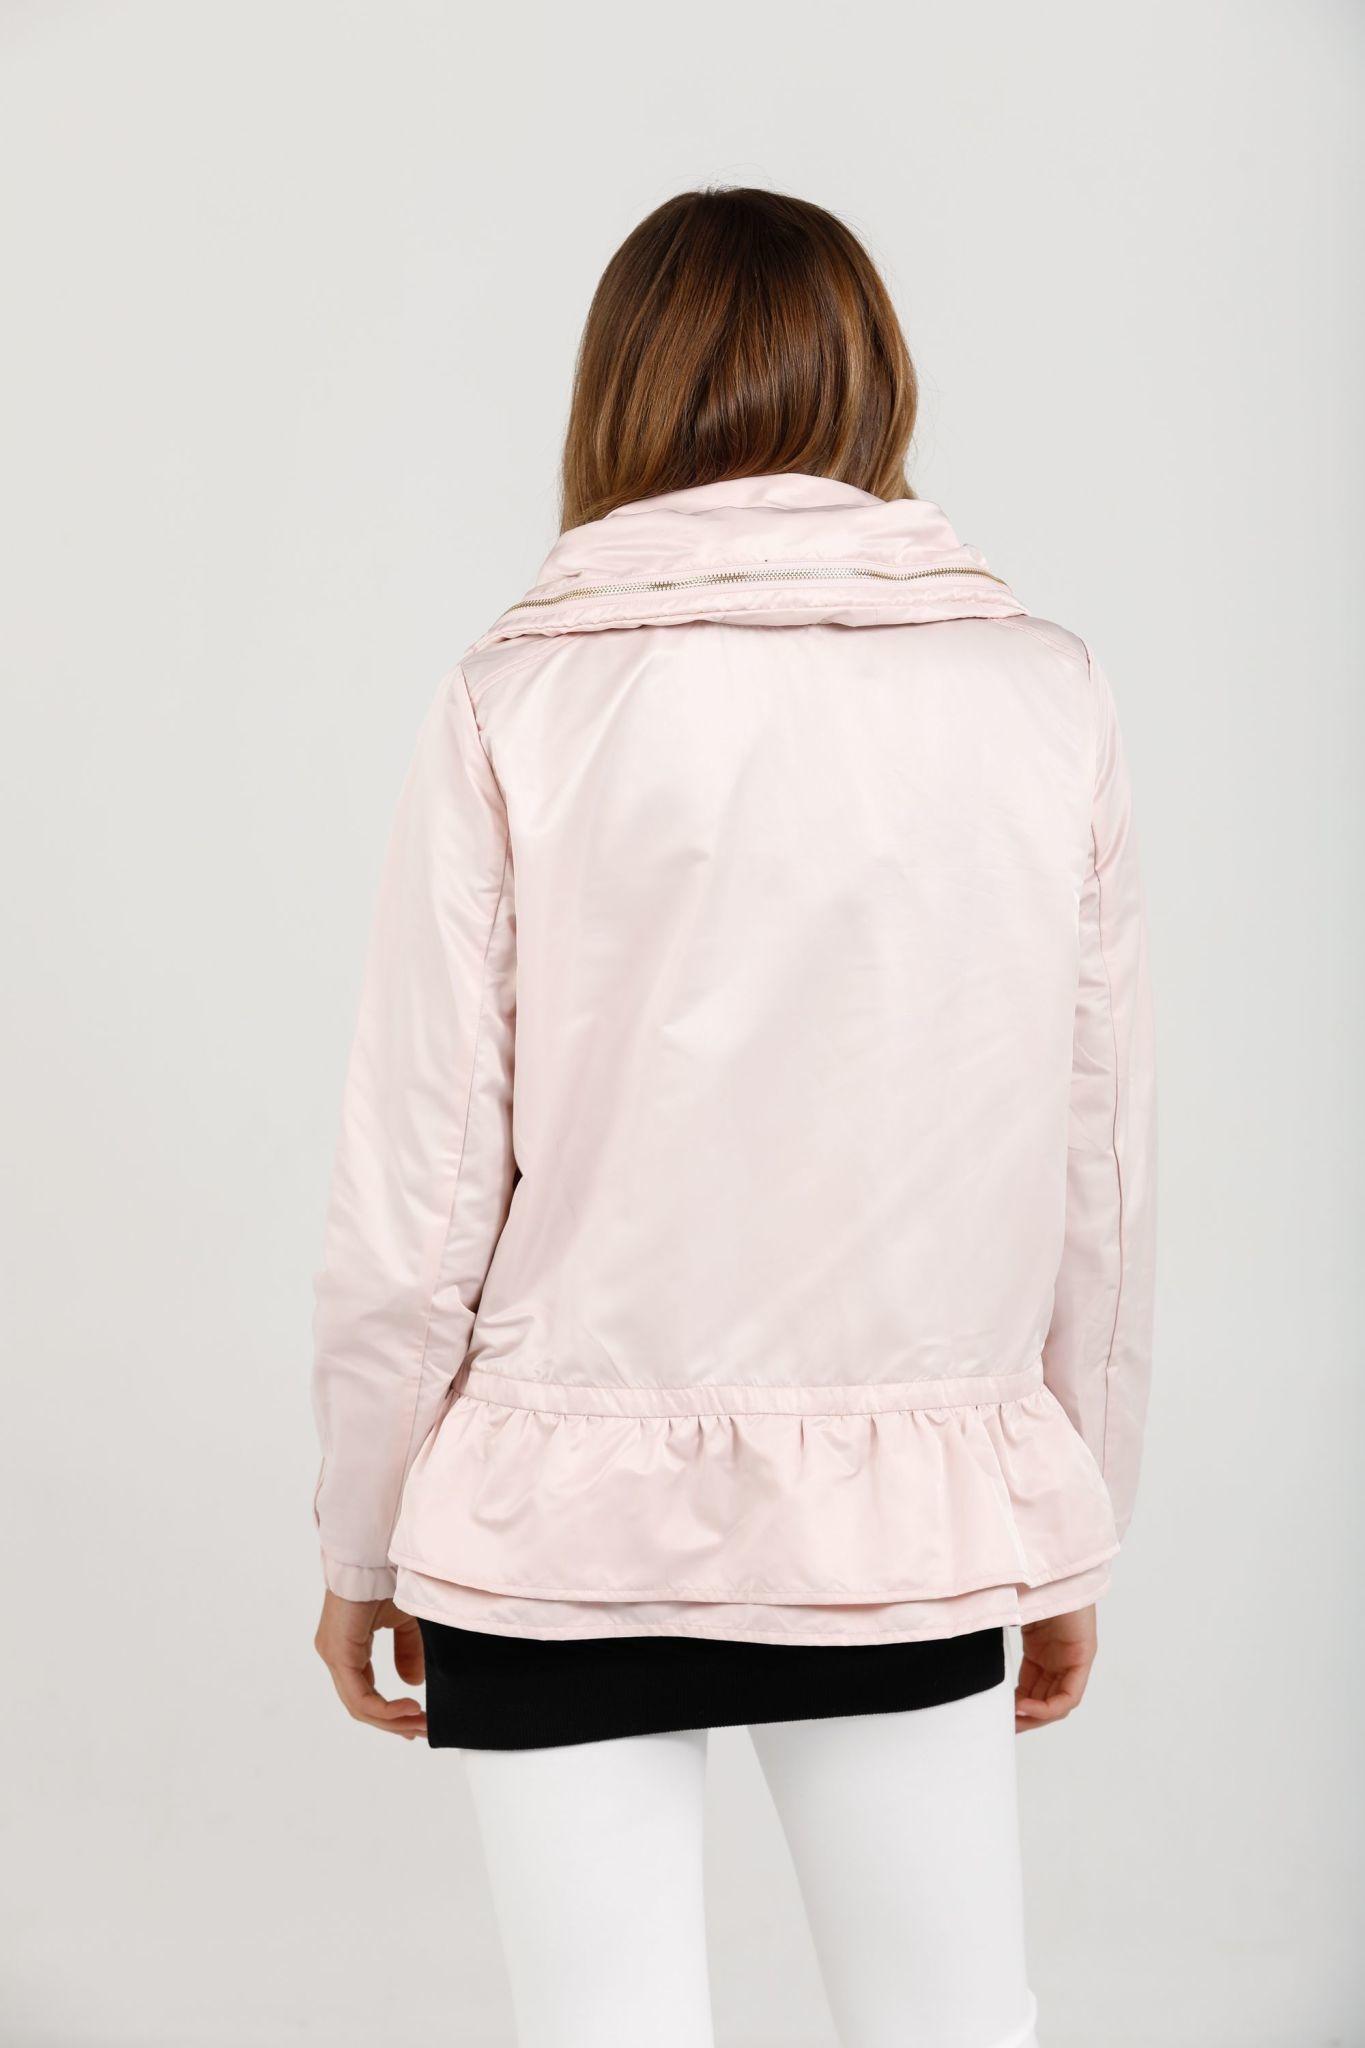 Danbury Jacket